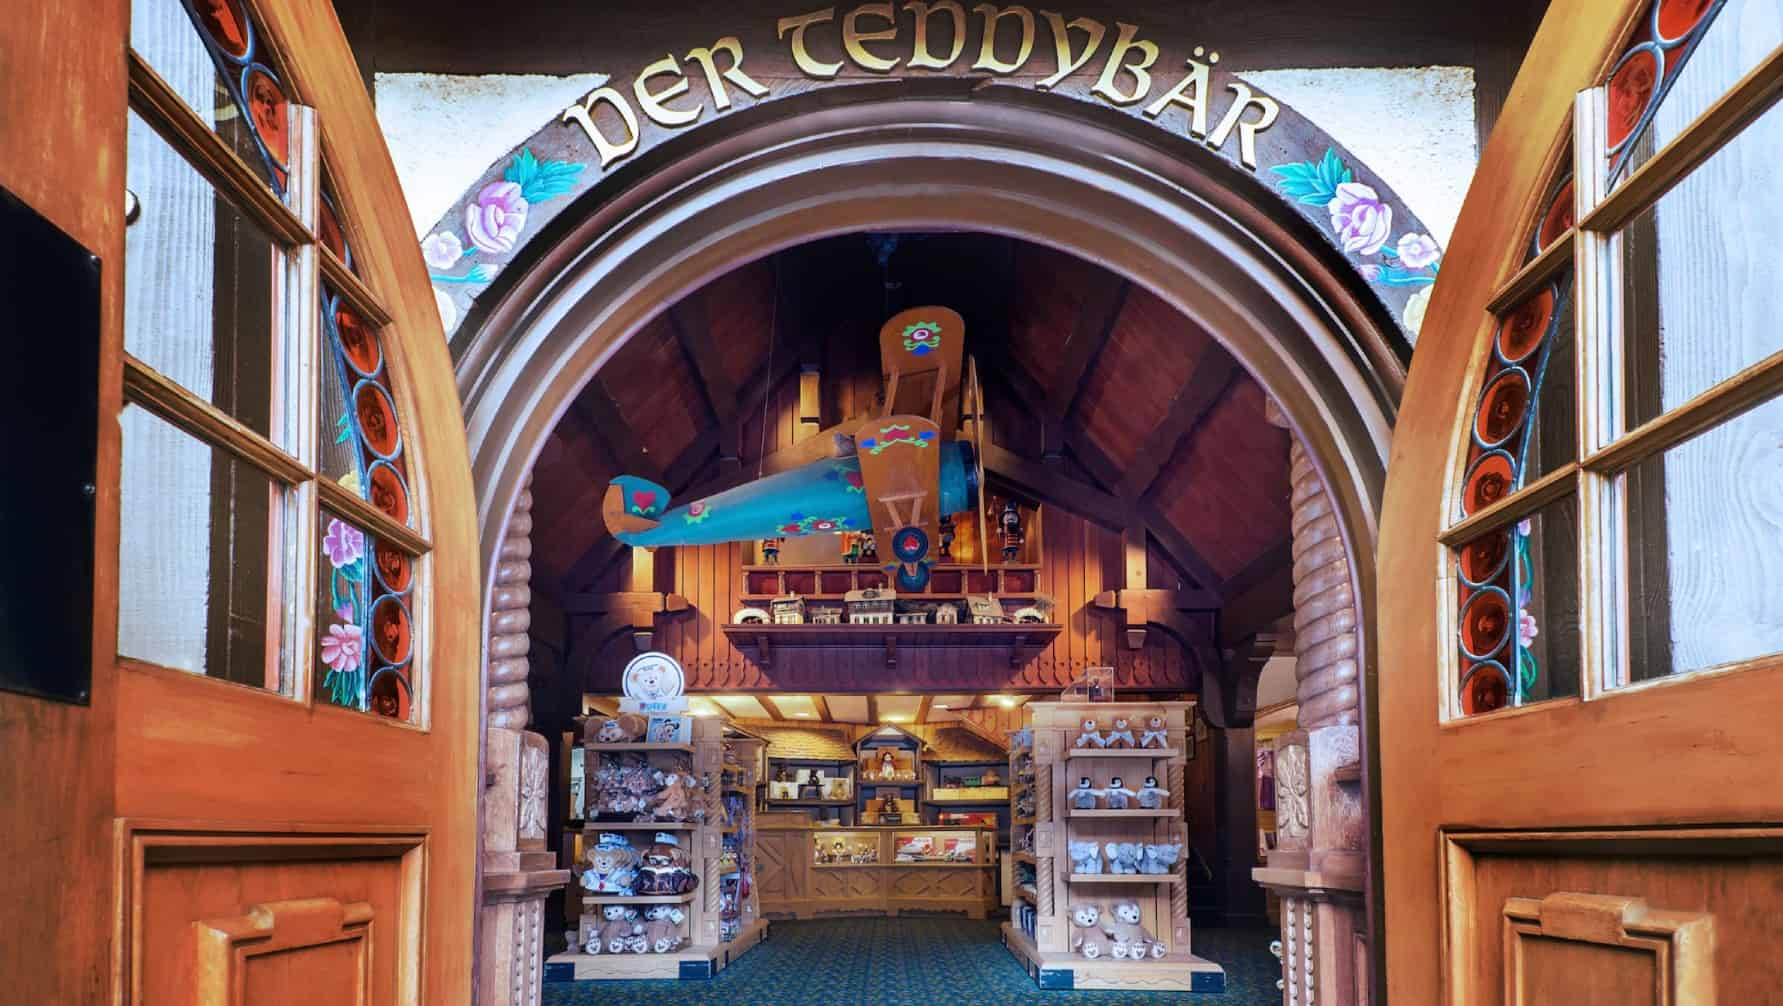 Der Teddybar in Germany pavilion at Epcot